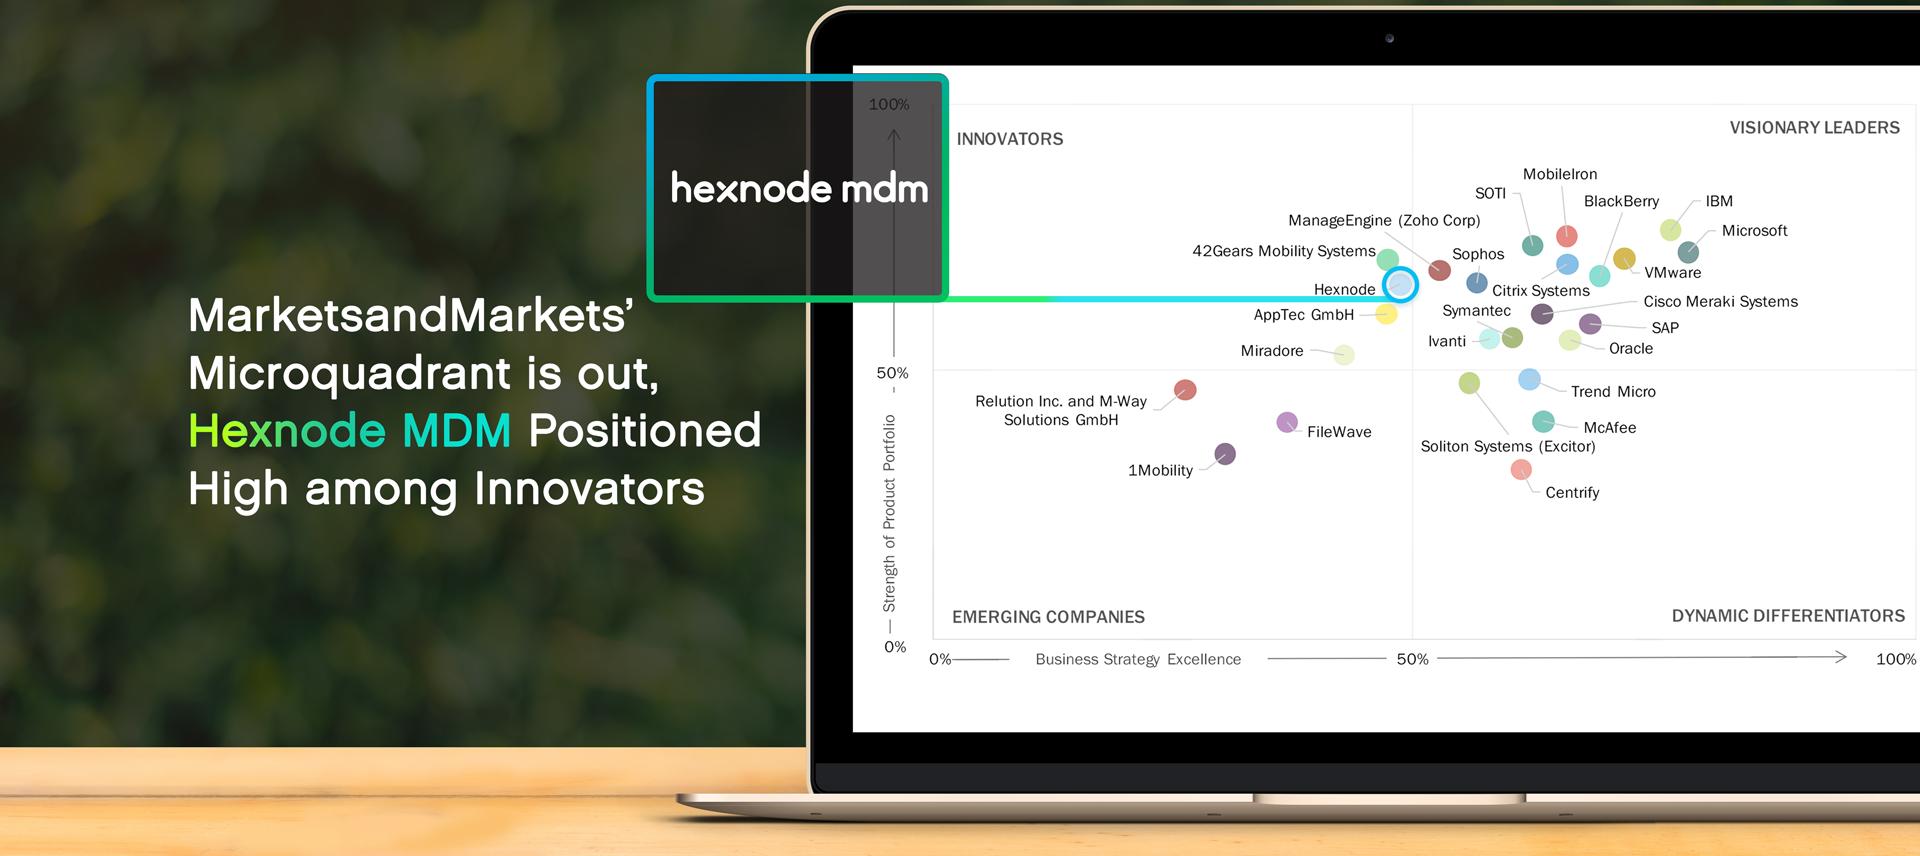 MarketsandMarkets' Microquadrant is Out, Hexnode MDM